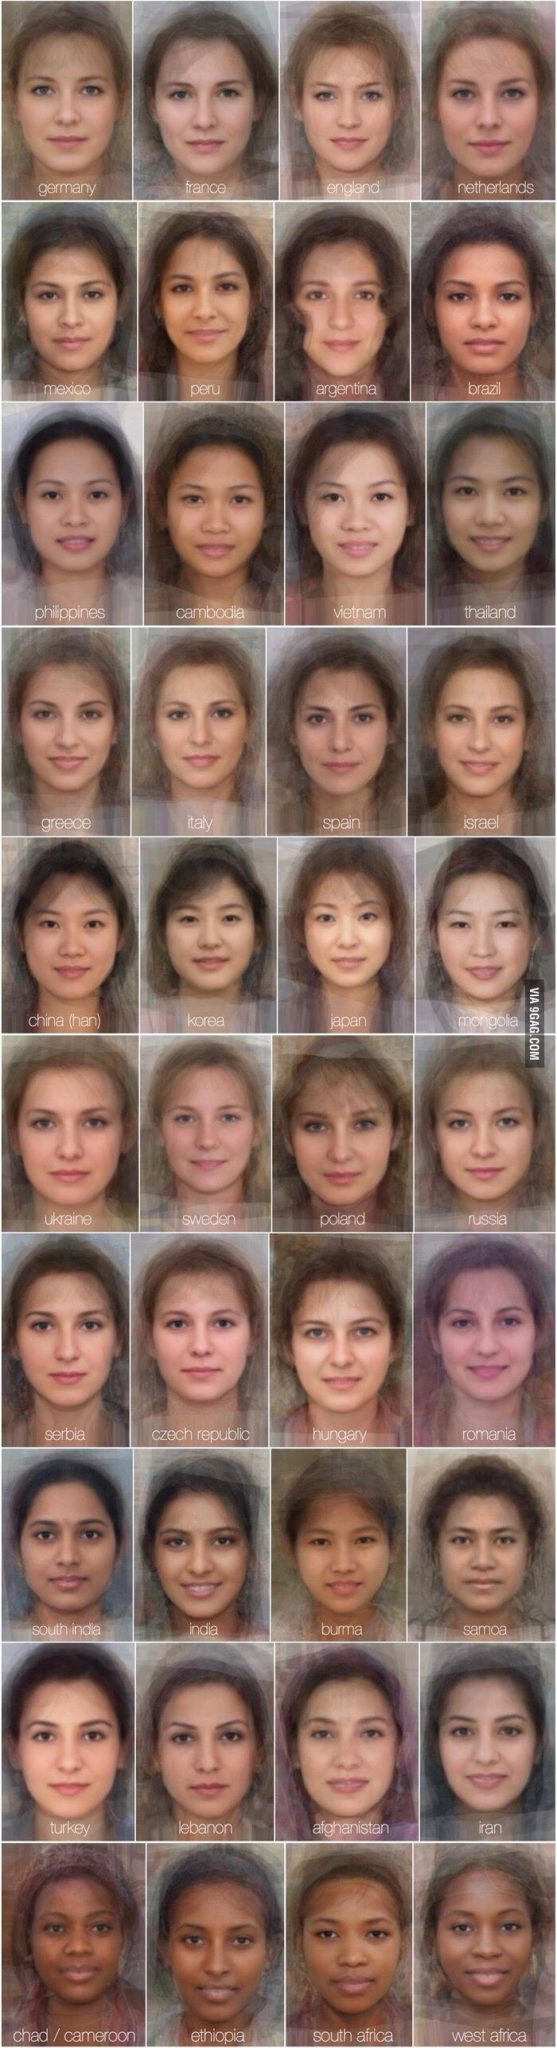 Ethnicity facial features